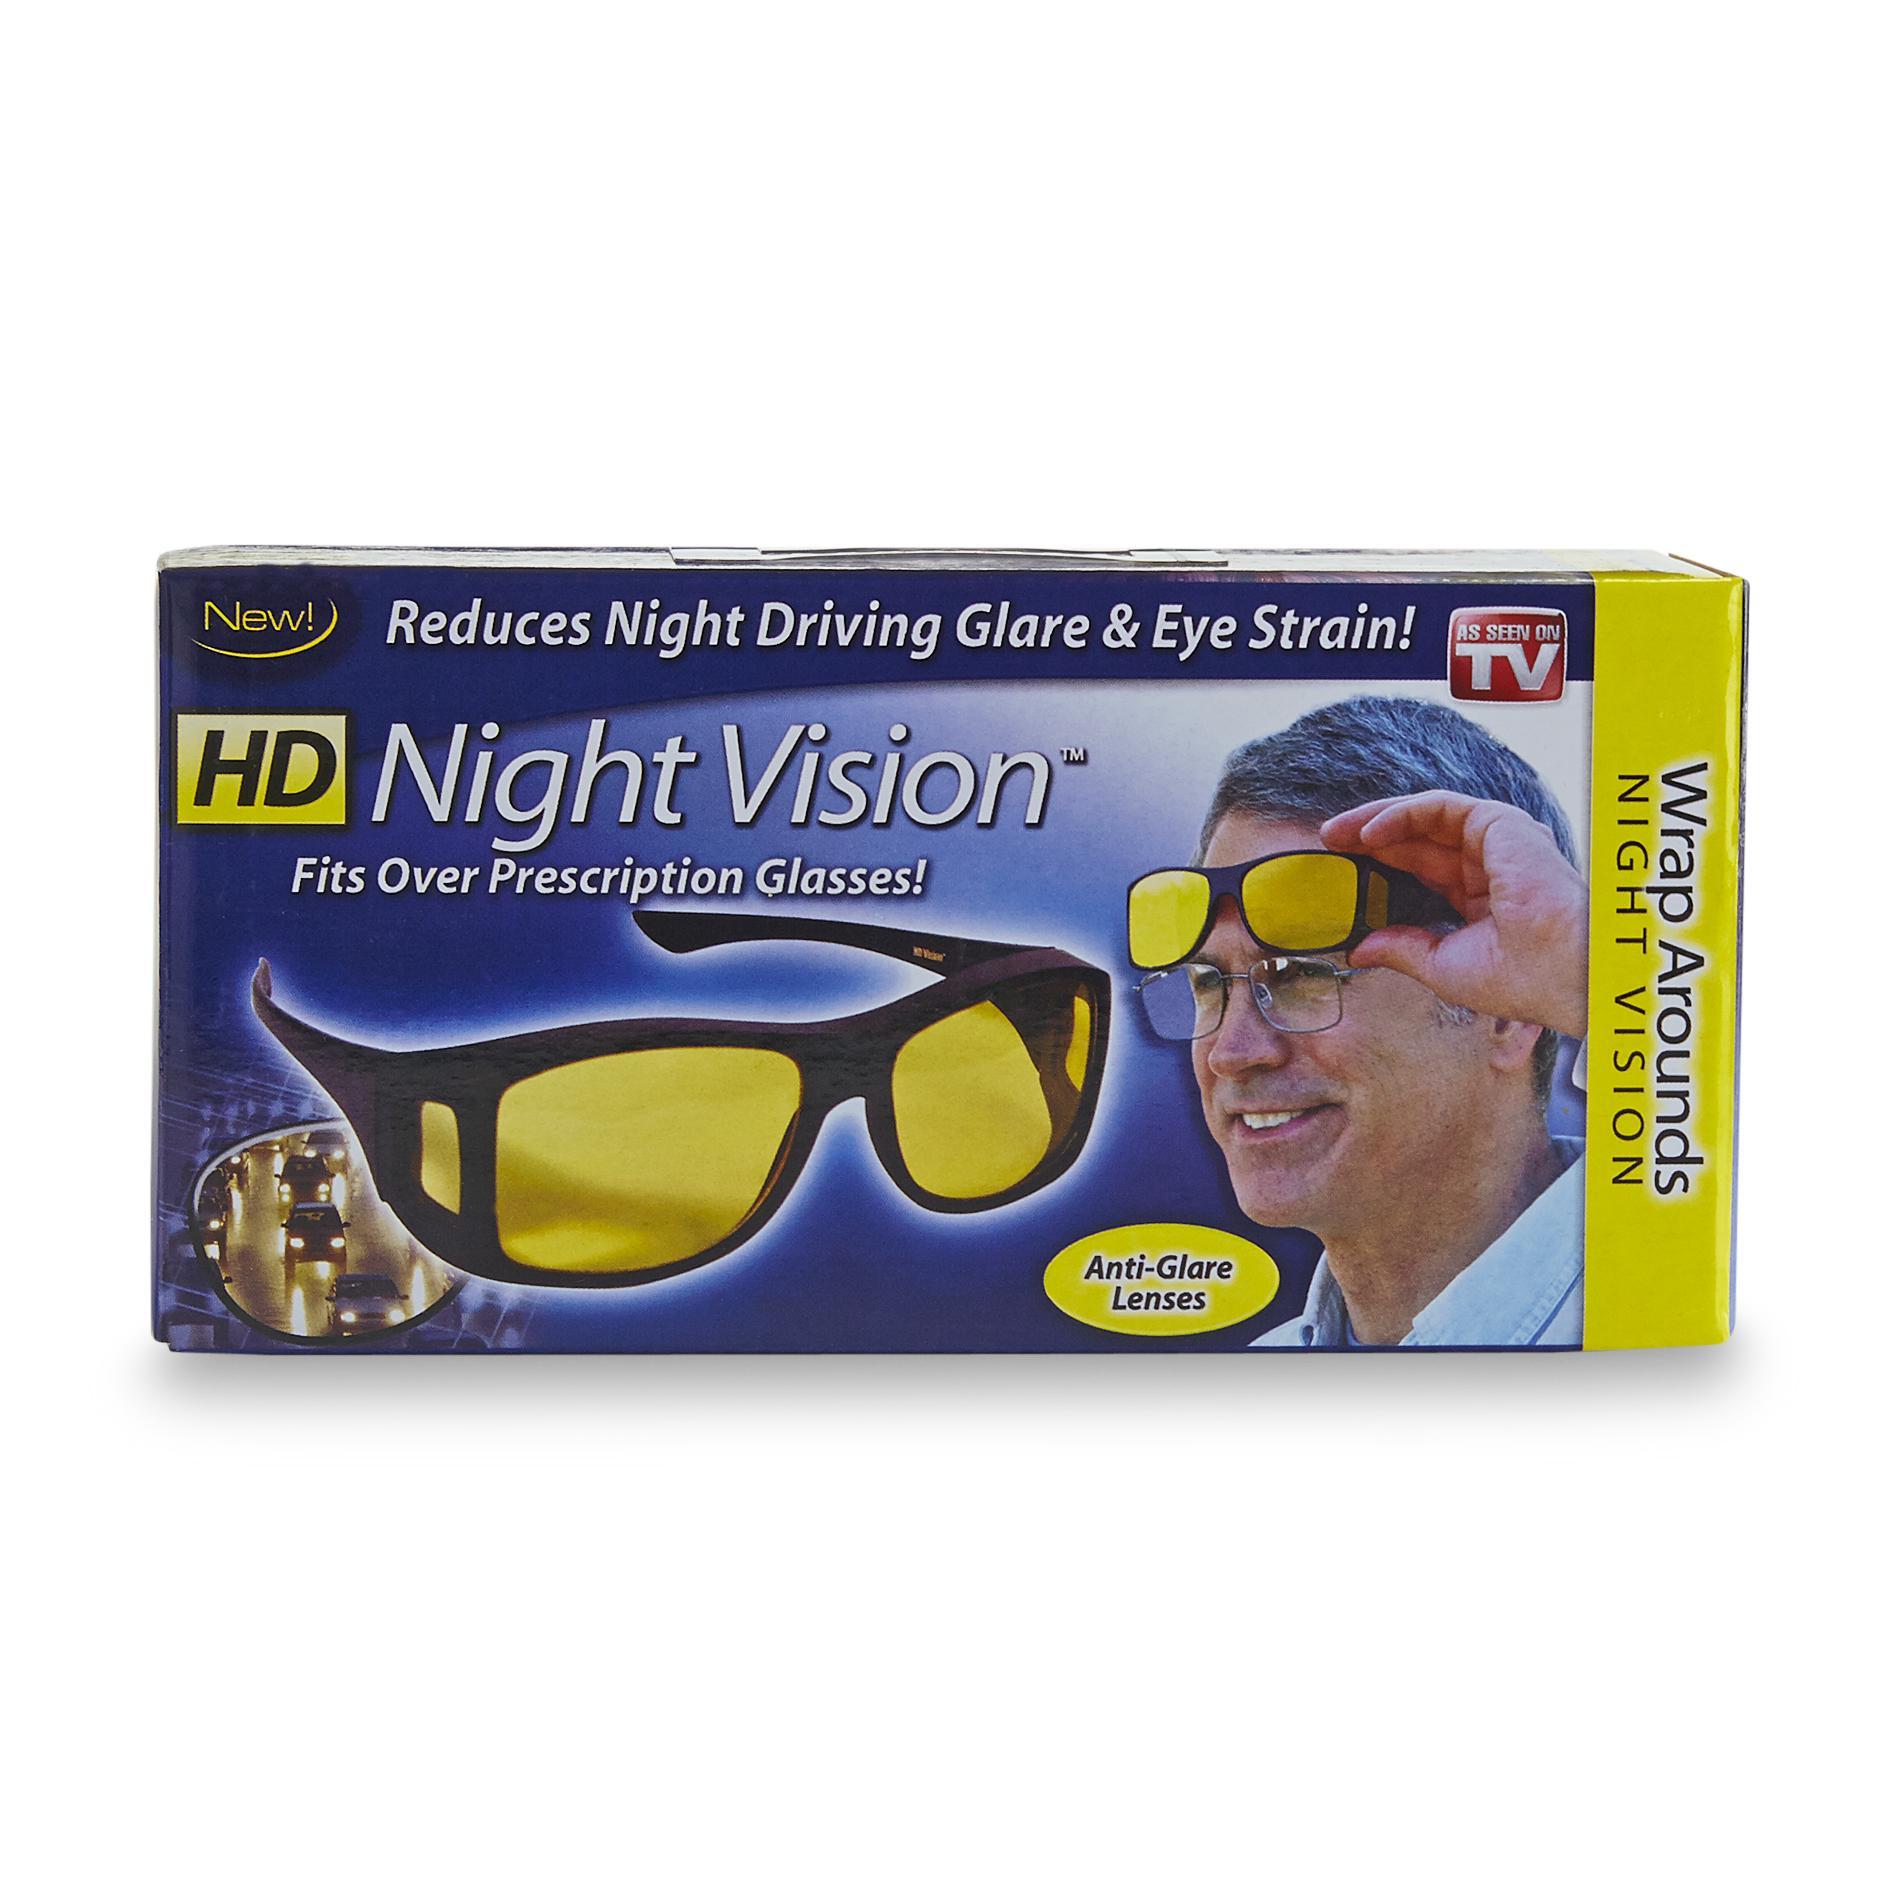 As Seen On TV HD Night Vision Wraparound Glasses PartNumber: 00853762000P KsnValue: 7570424 MfgPartNumber: HDWRAPN